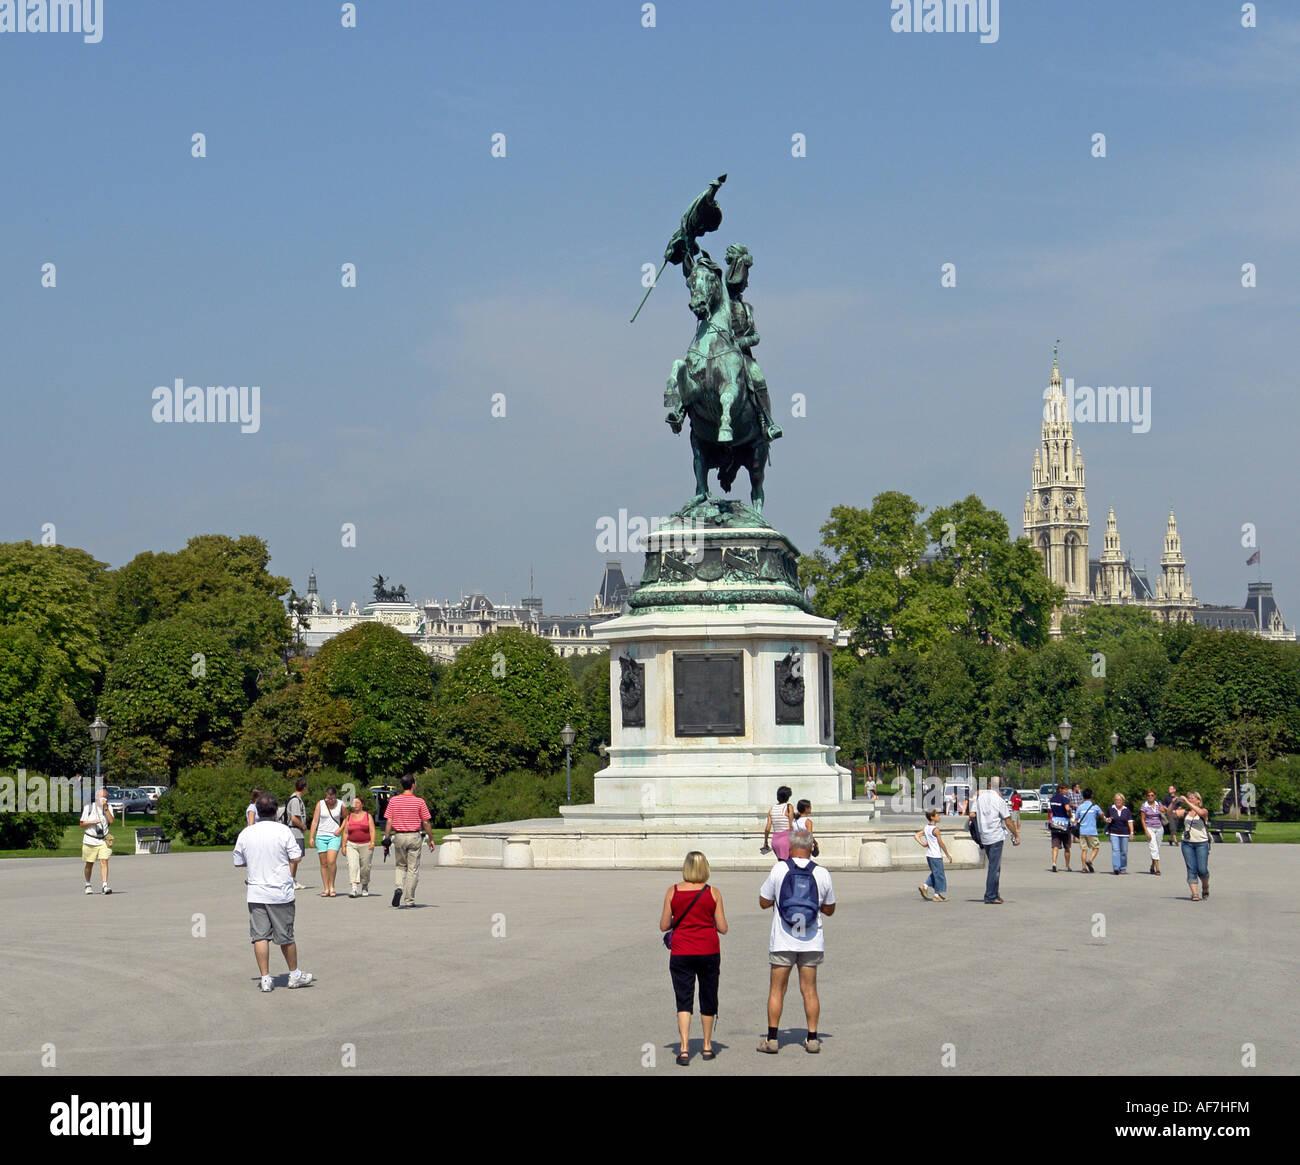 The impressive equestrian statue of Archduke Karl in Heldenplatz Hofburg Vienna centre Austria - Stock Image